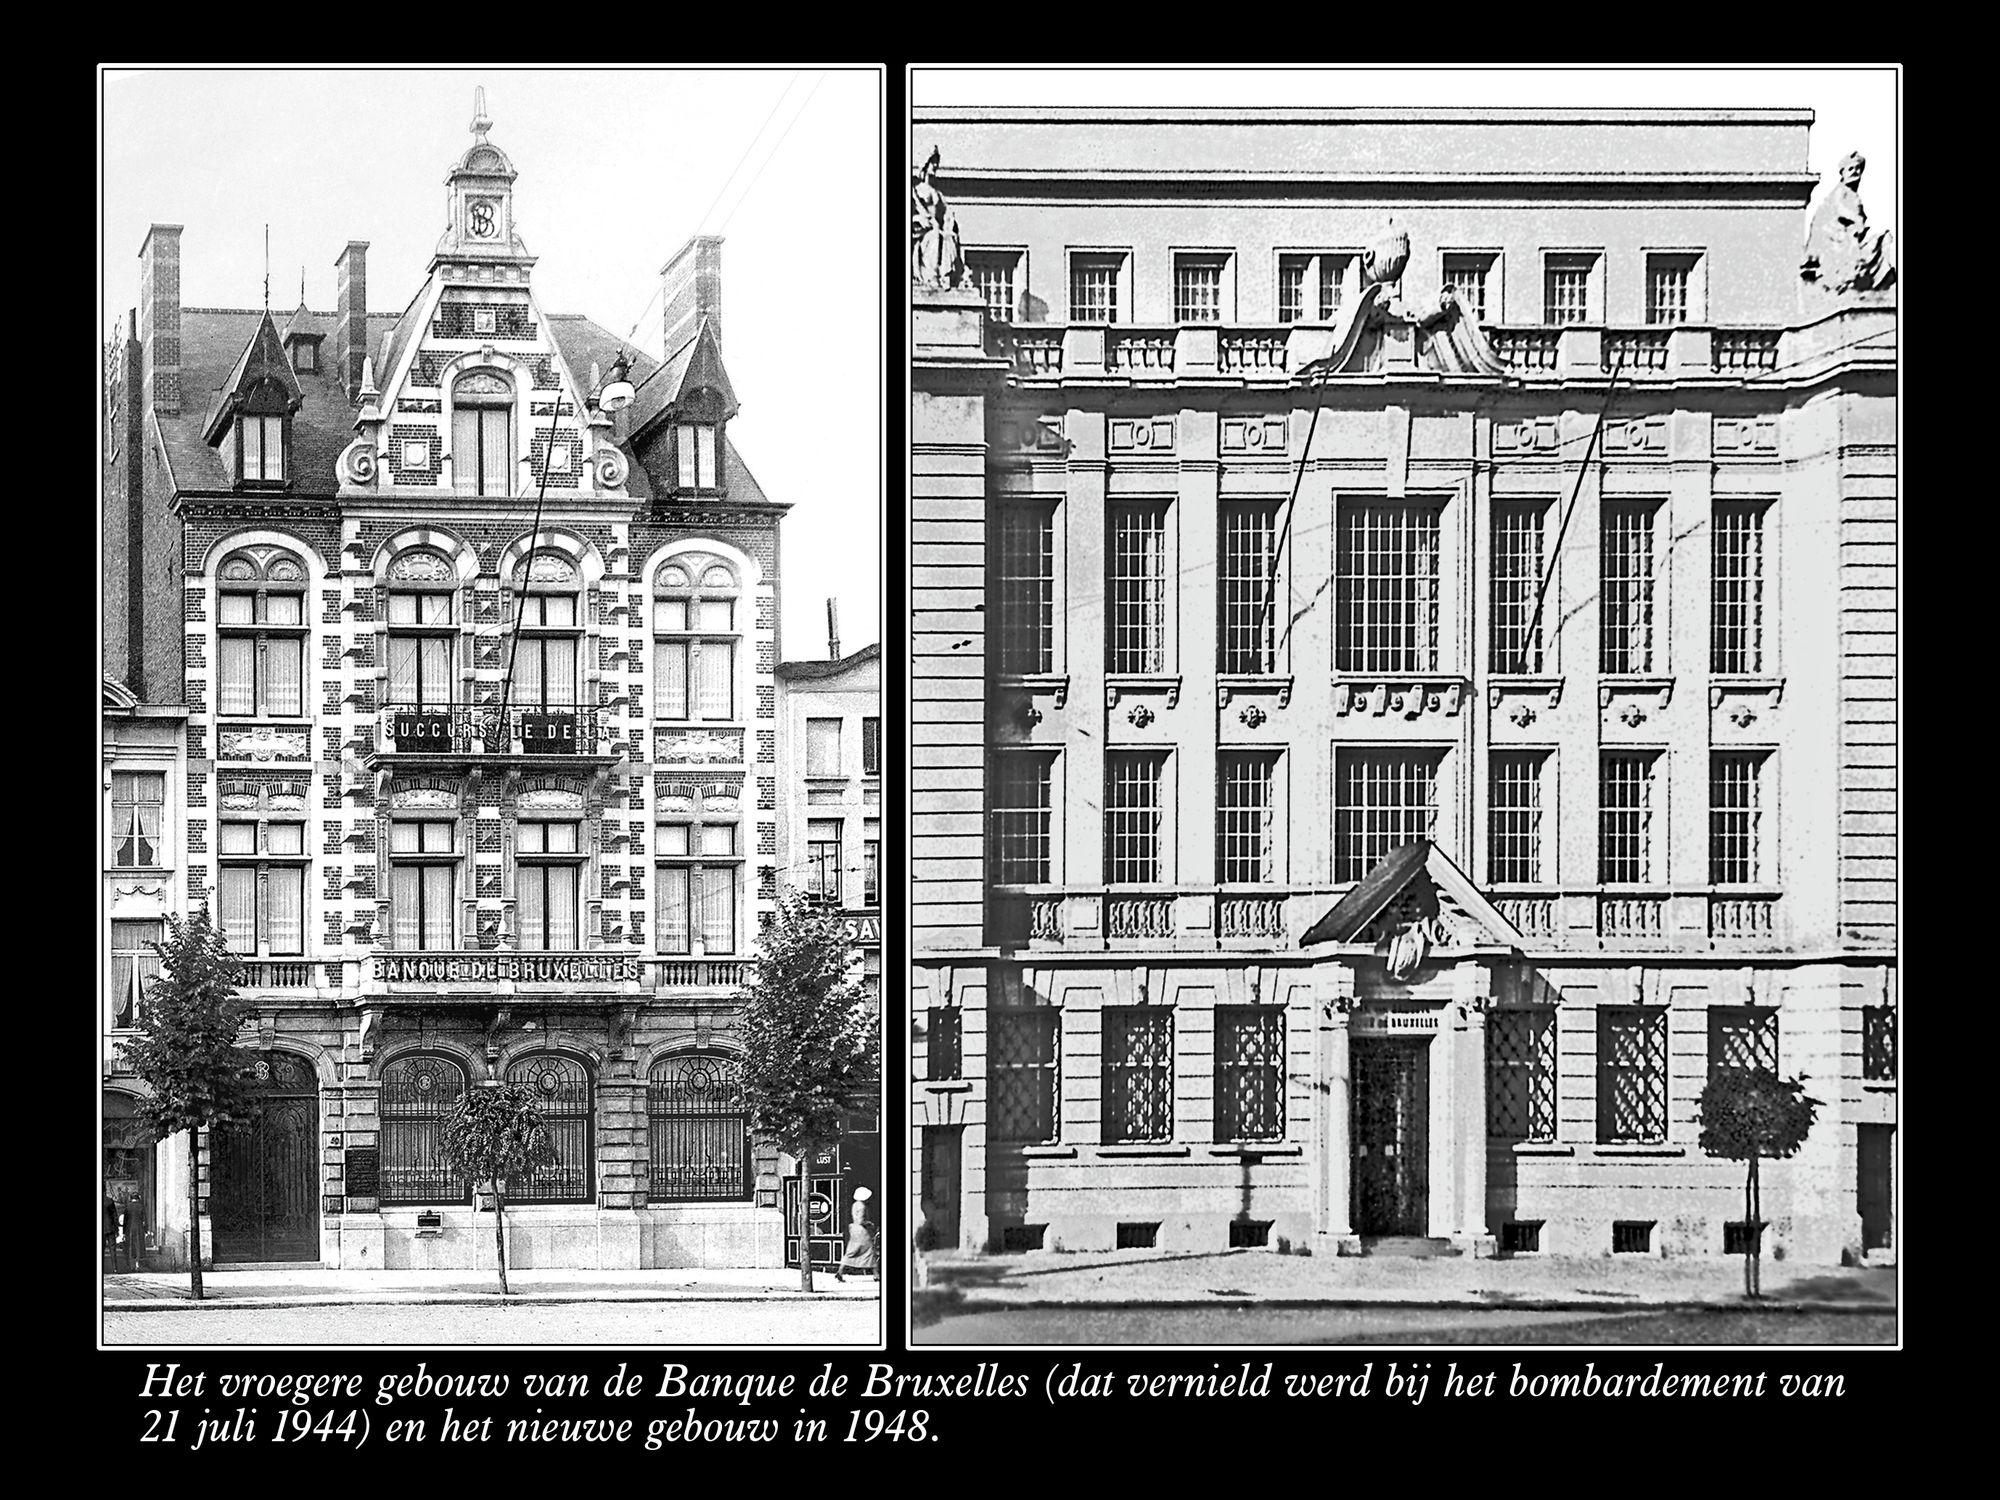 La Banque de Bruxelles